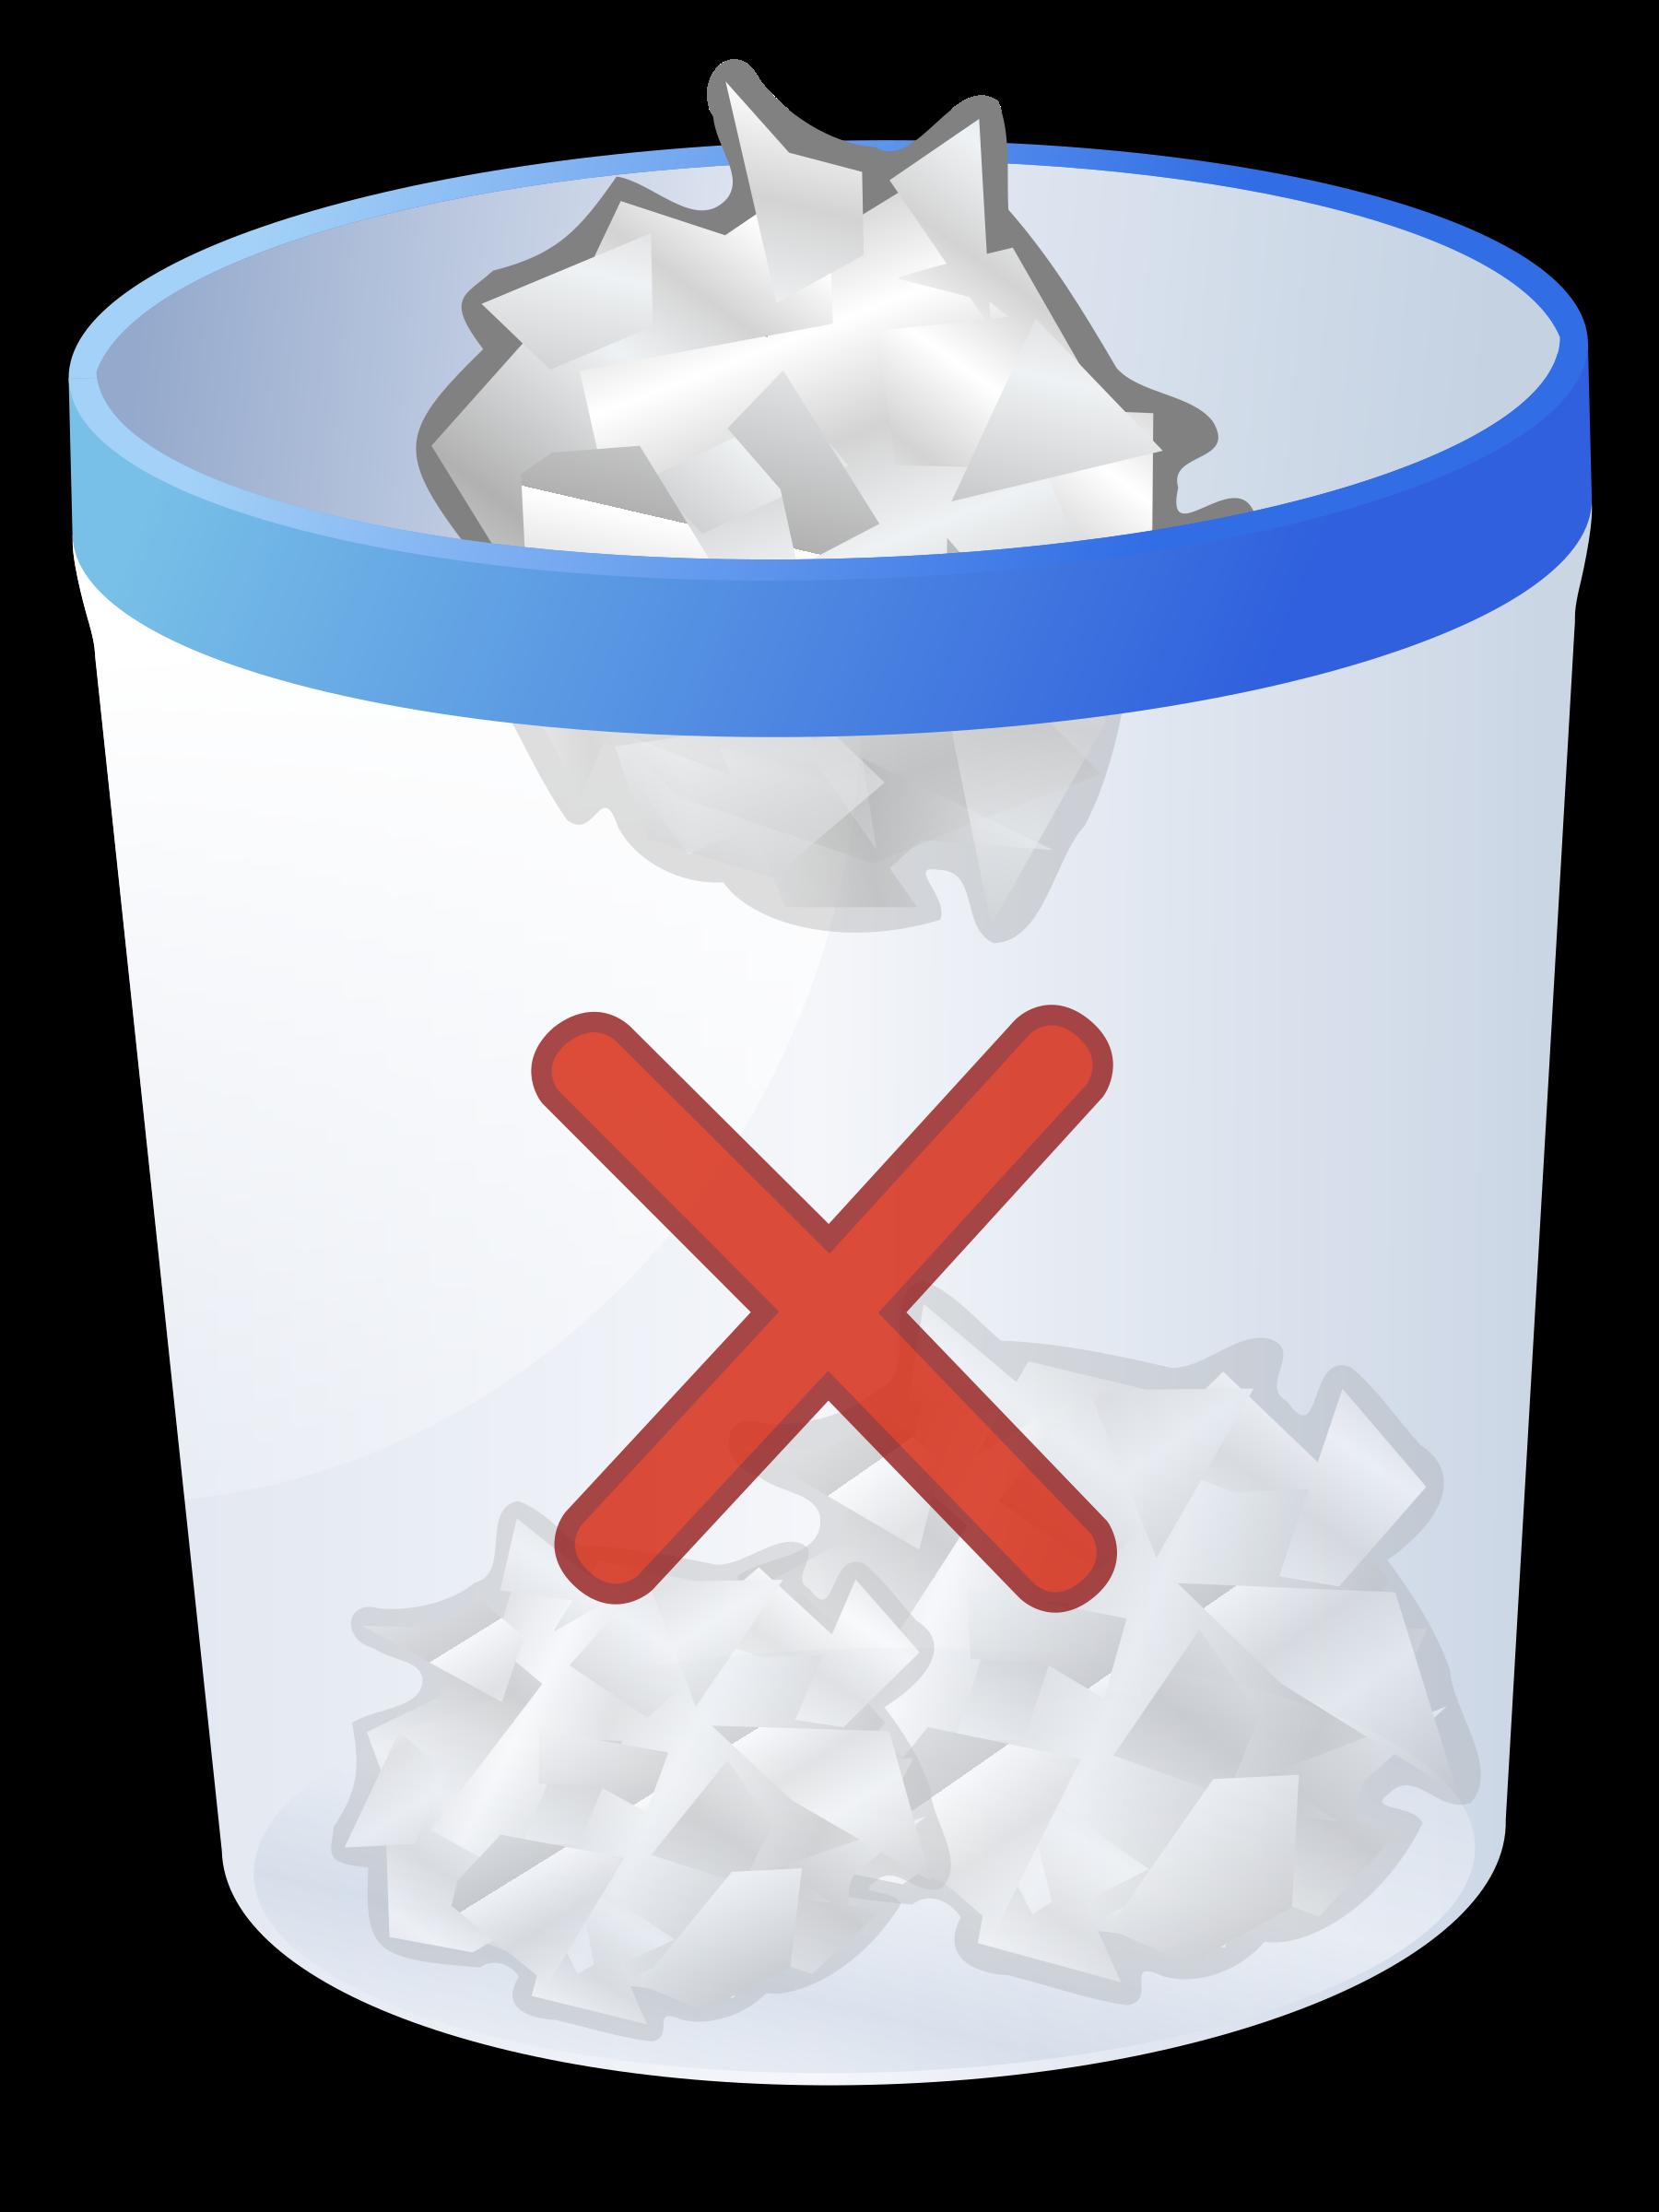 Trash bins big image. Clipart cross animated